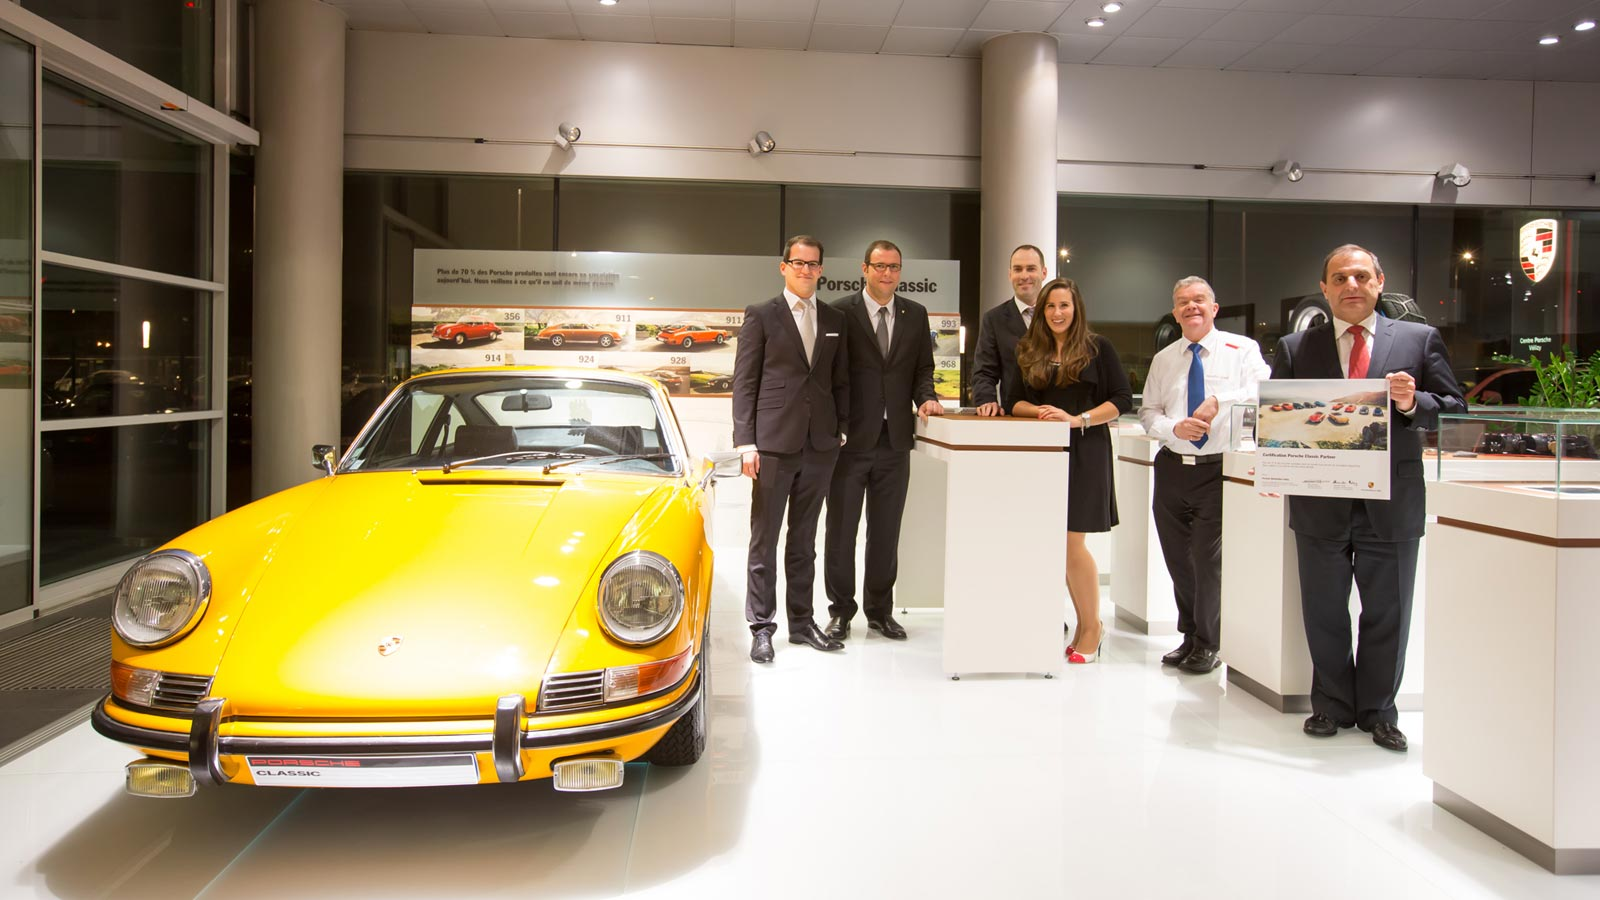 Porsche - Порше Центр Велизи